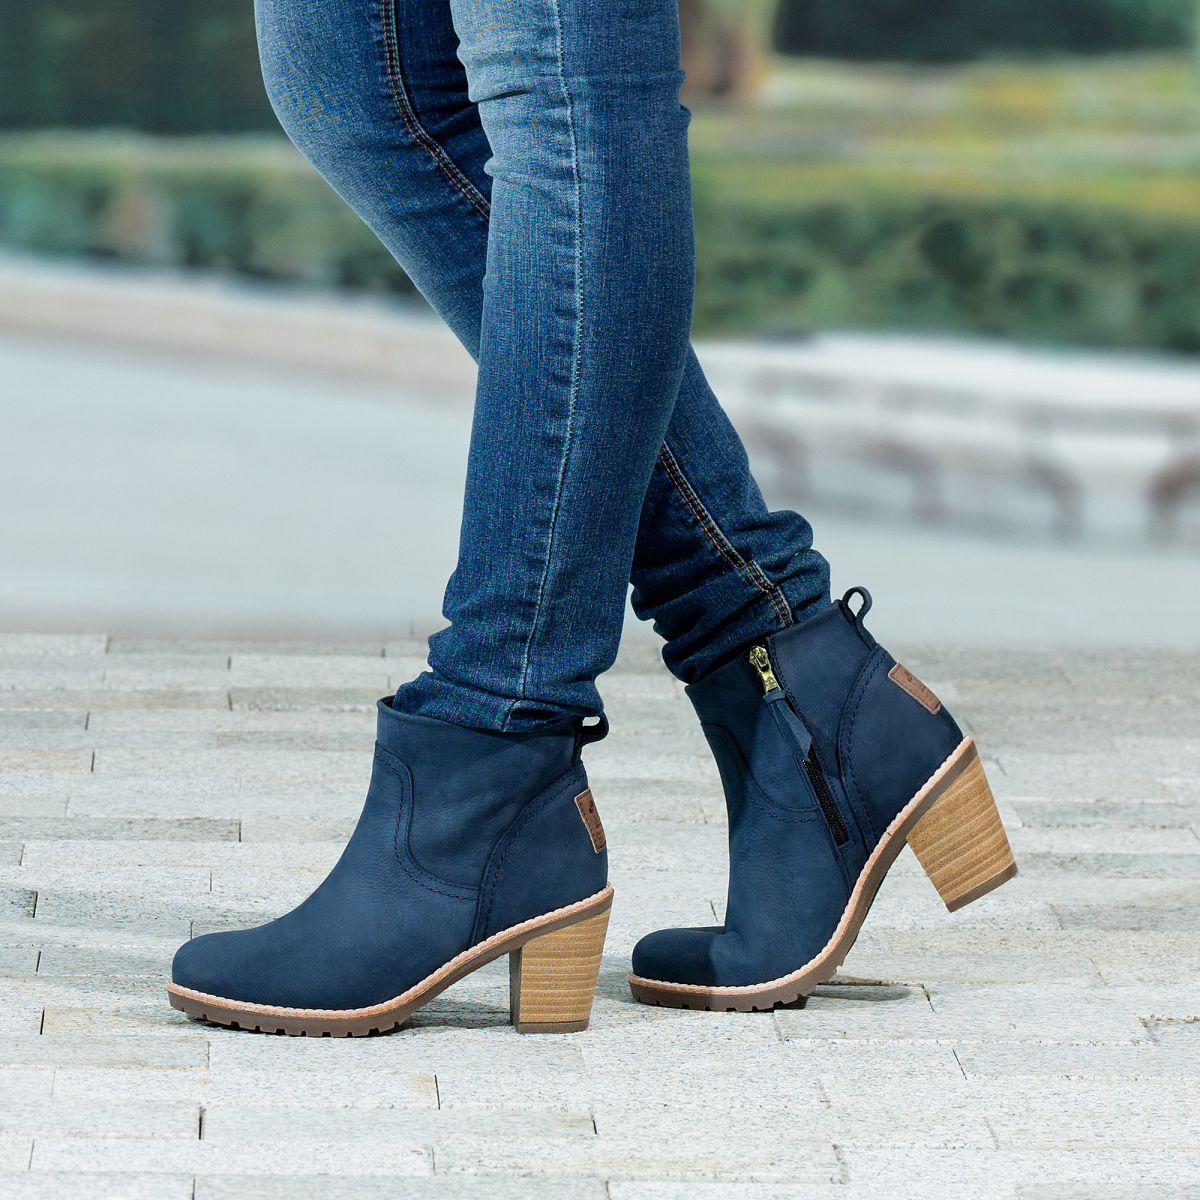 Womens ankle boots arles blue panama jack 174 online shop